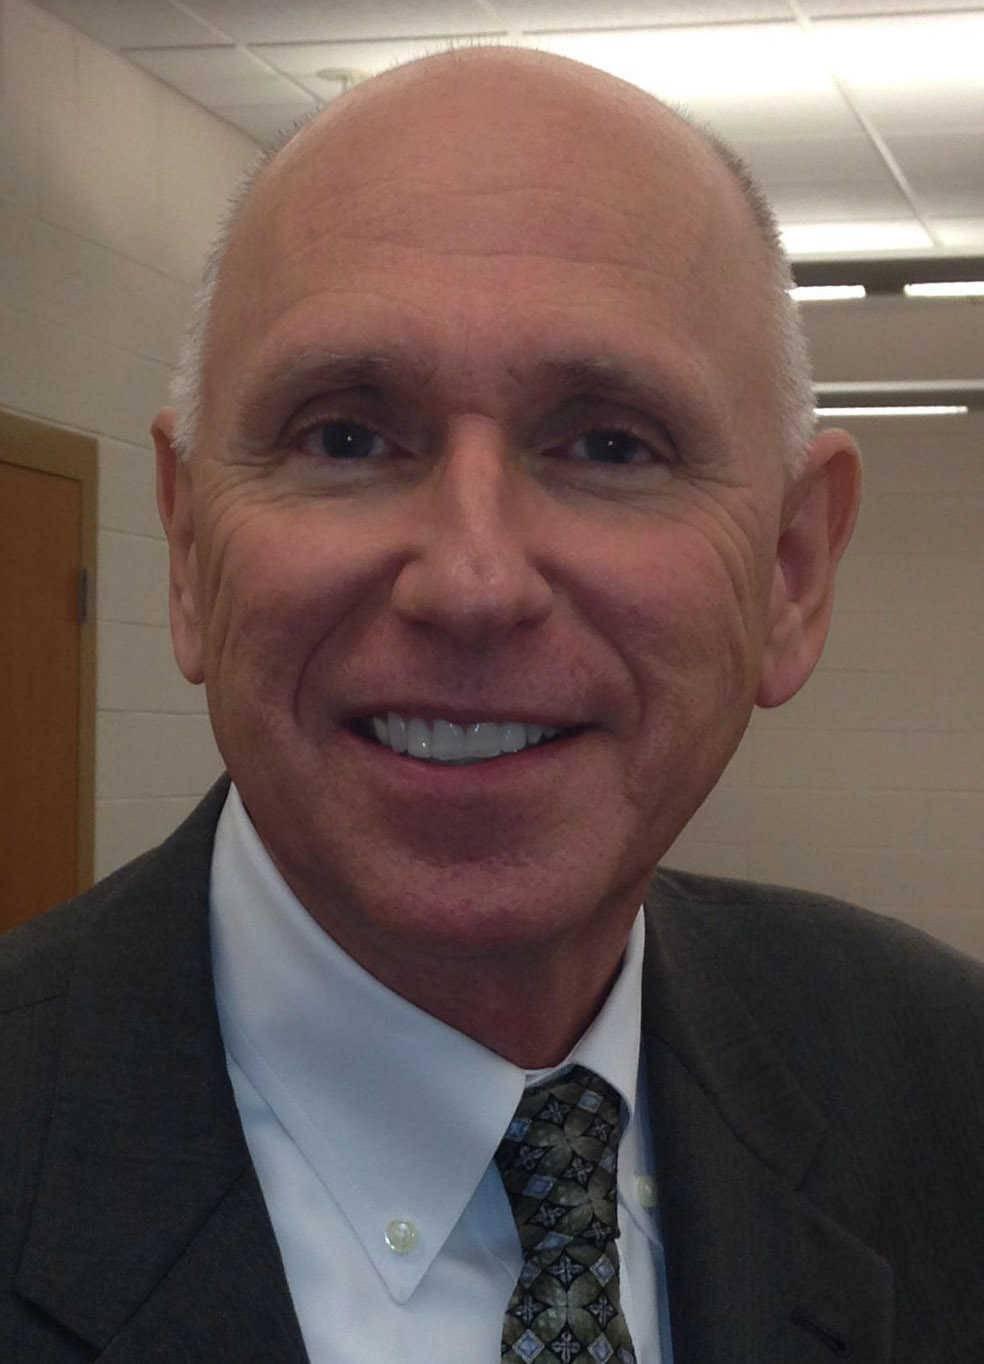 Kaneland interim superintendent hired Monday quits